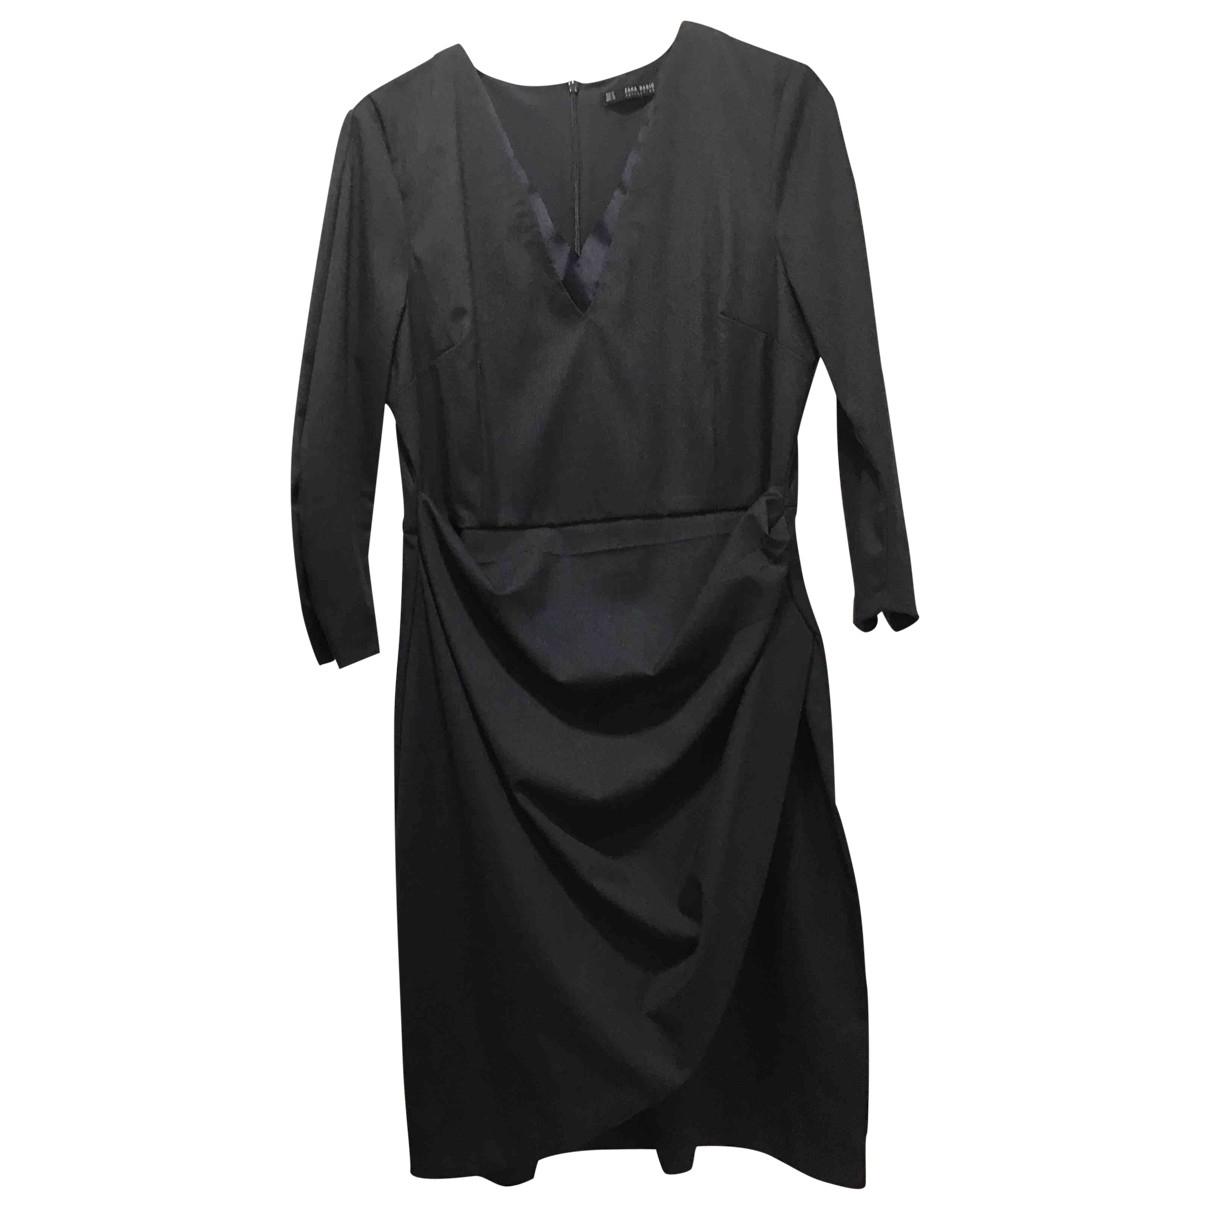 Zara \N Kleid in  Marine Polyester